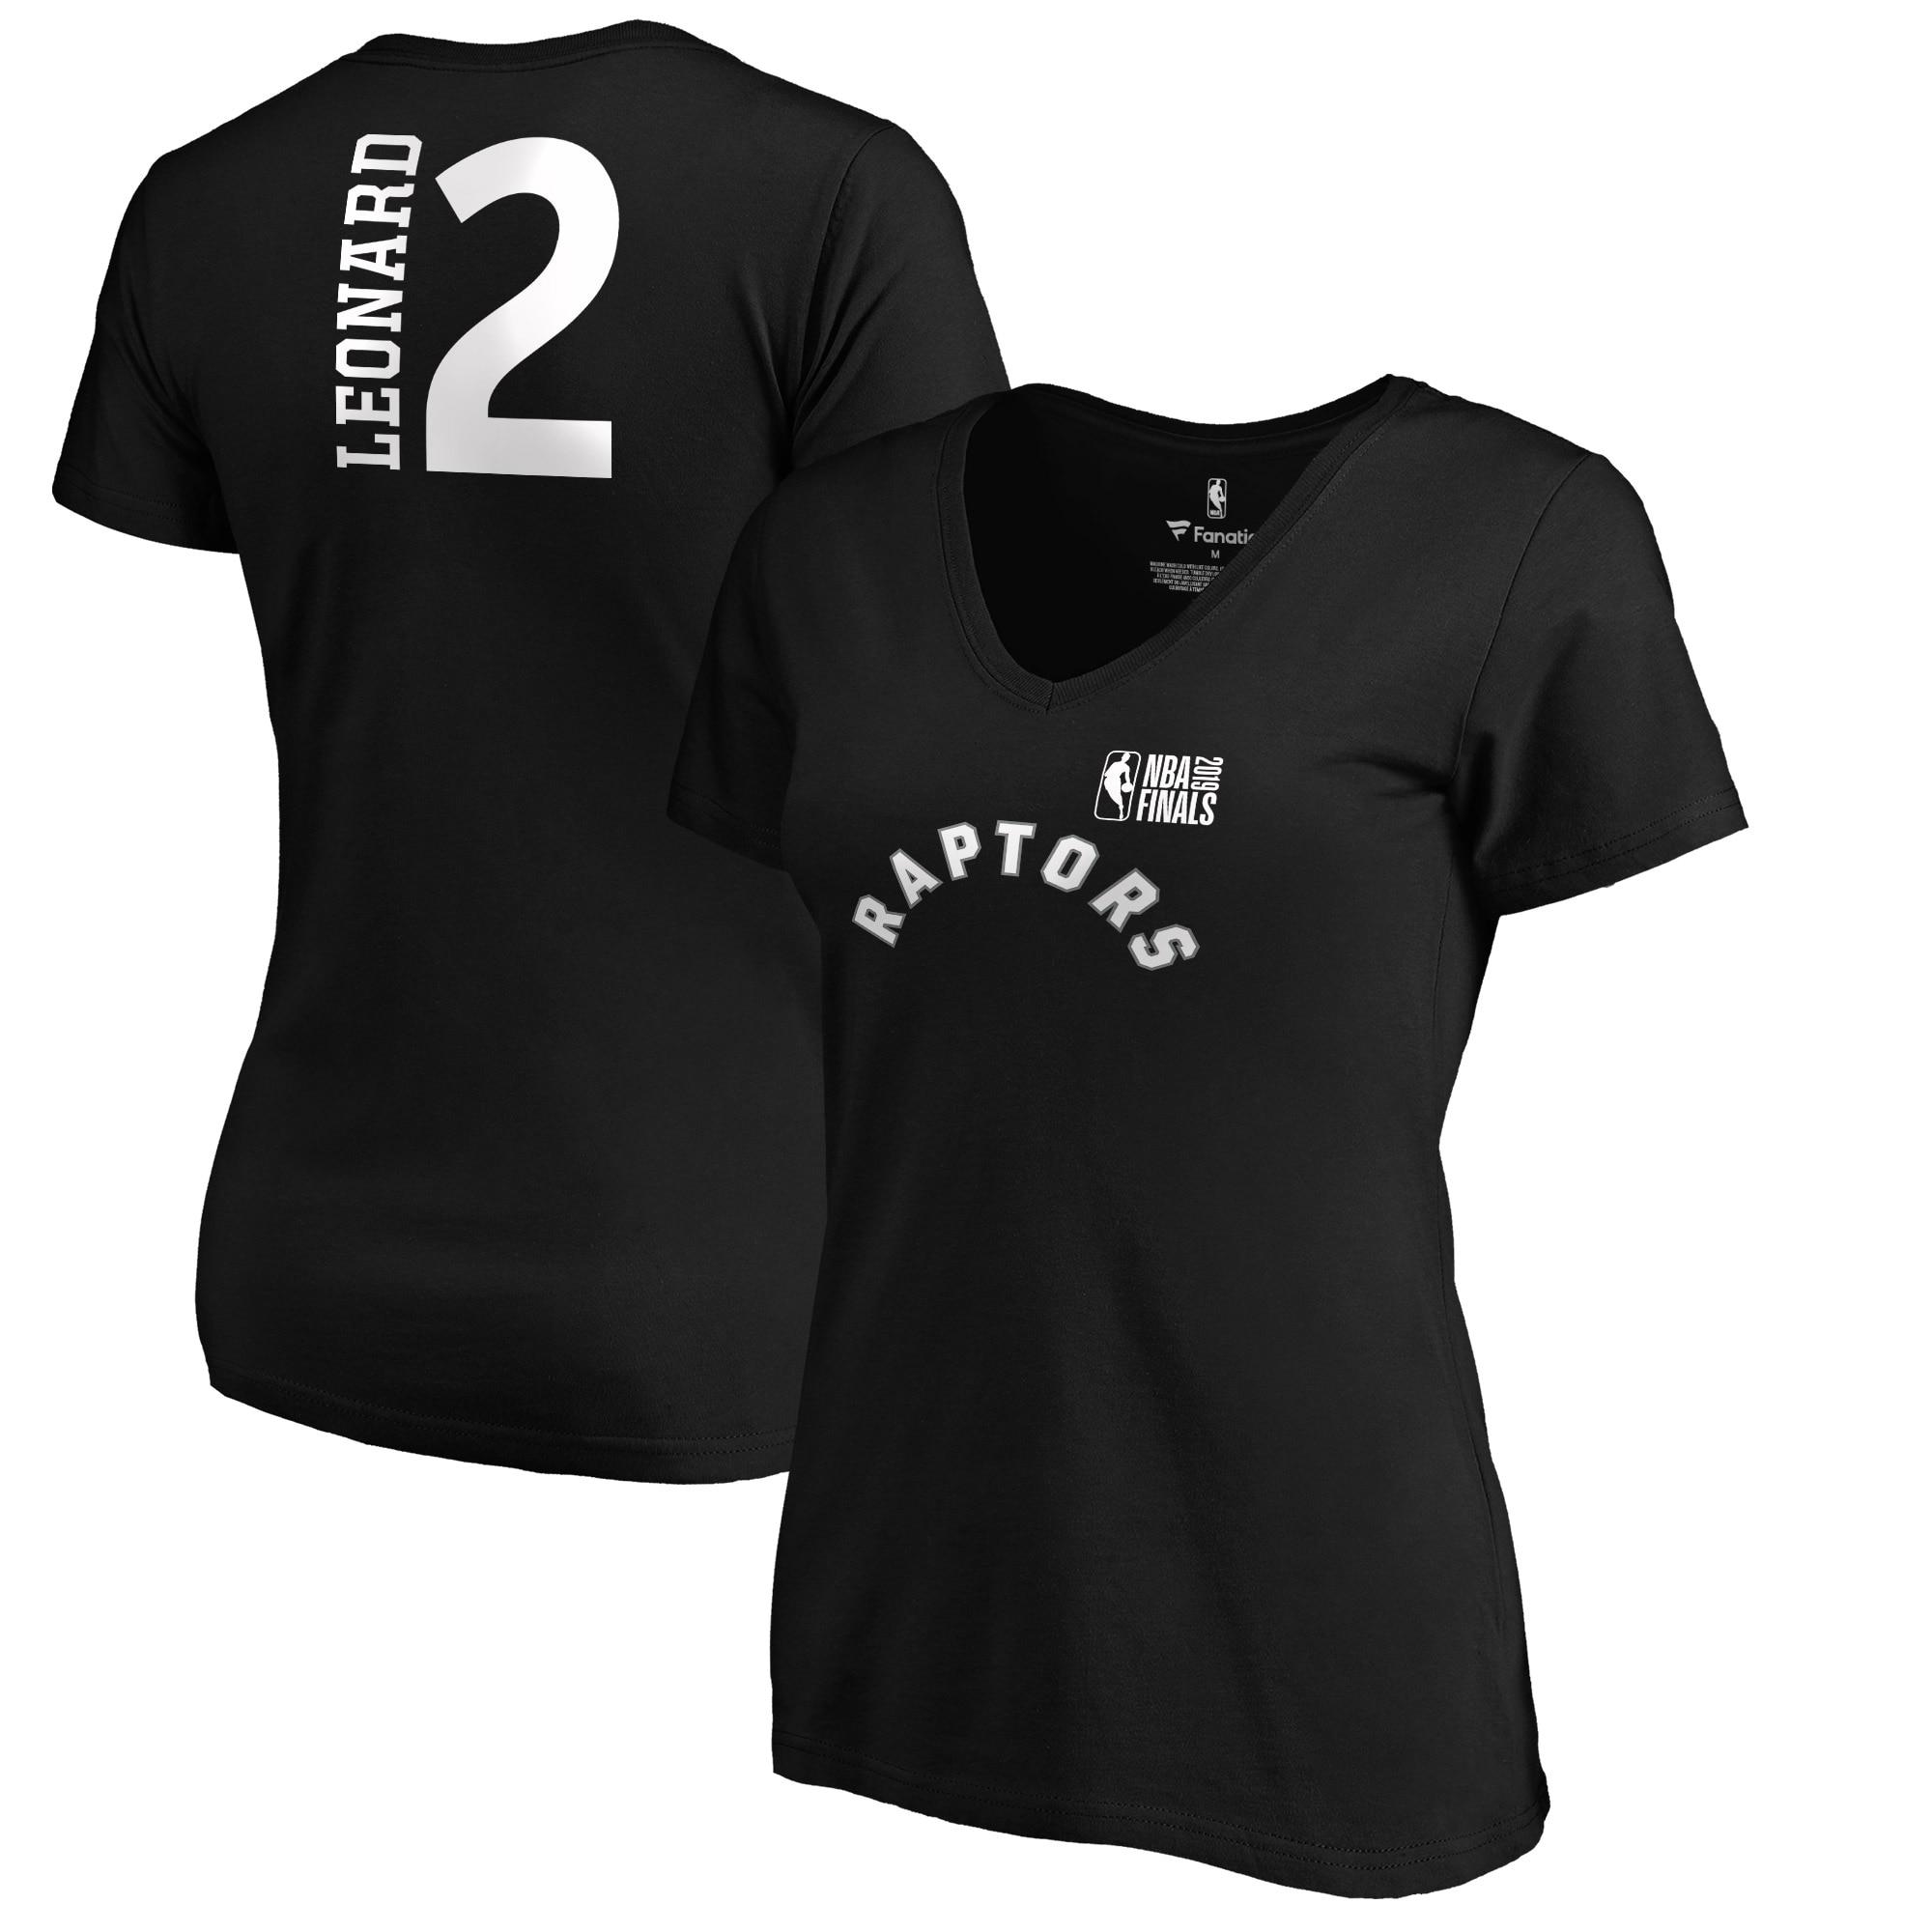 Kawhi Leonard Toronto Raptors Fanatics Branded Women's 2019 NBA Finals Bound Name & Number V-Neck T-Shirt - Black